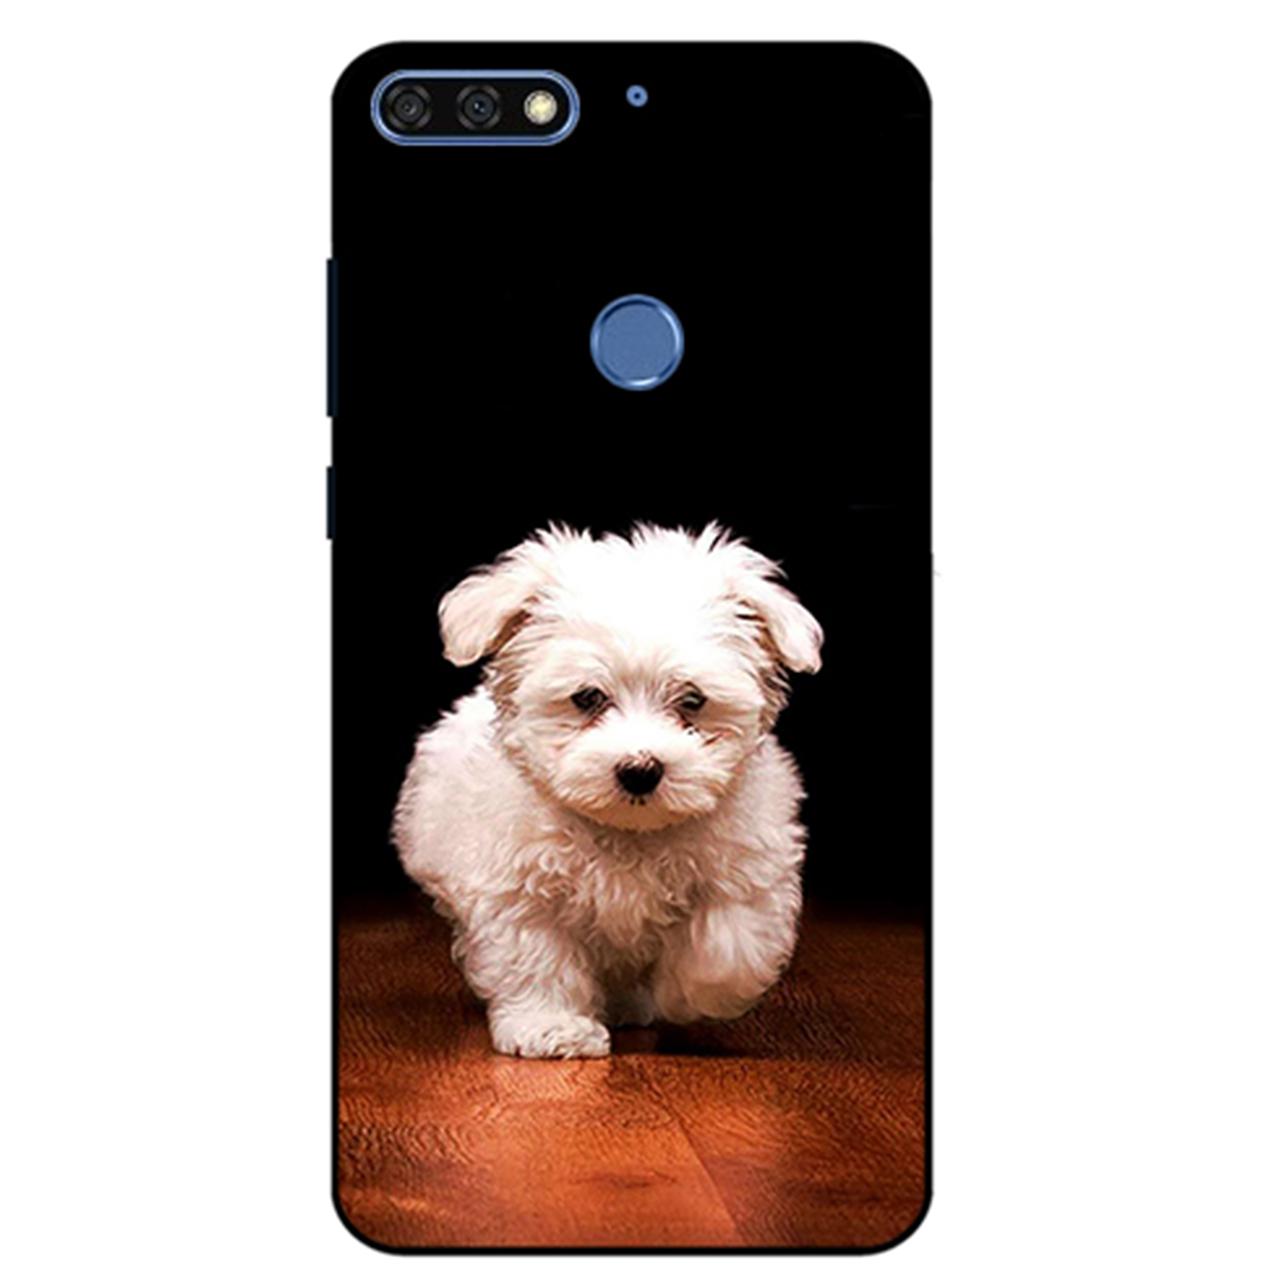 کاور کی اچ کد 6445 مناسب برای گوشی موبایل هوآوی Y7 Prime 2018